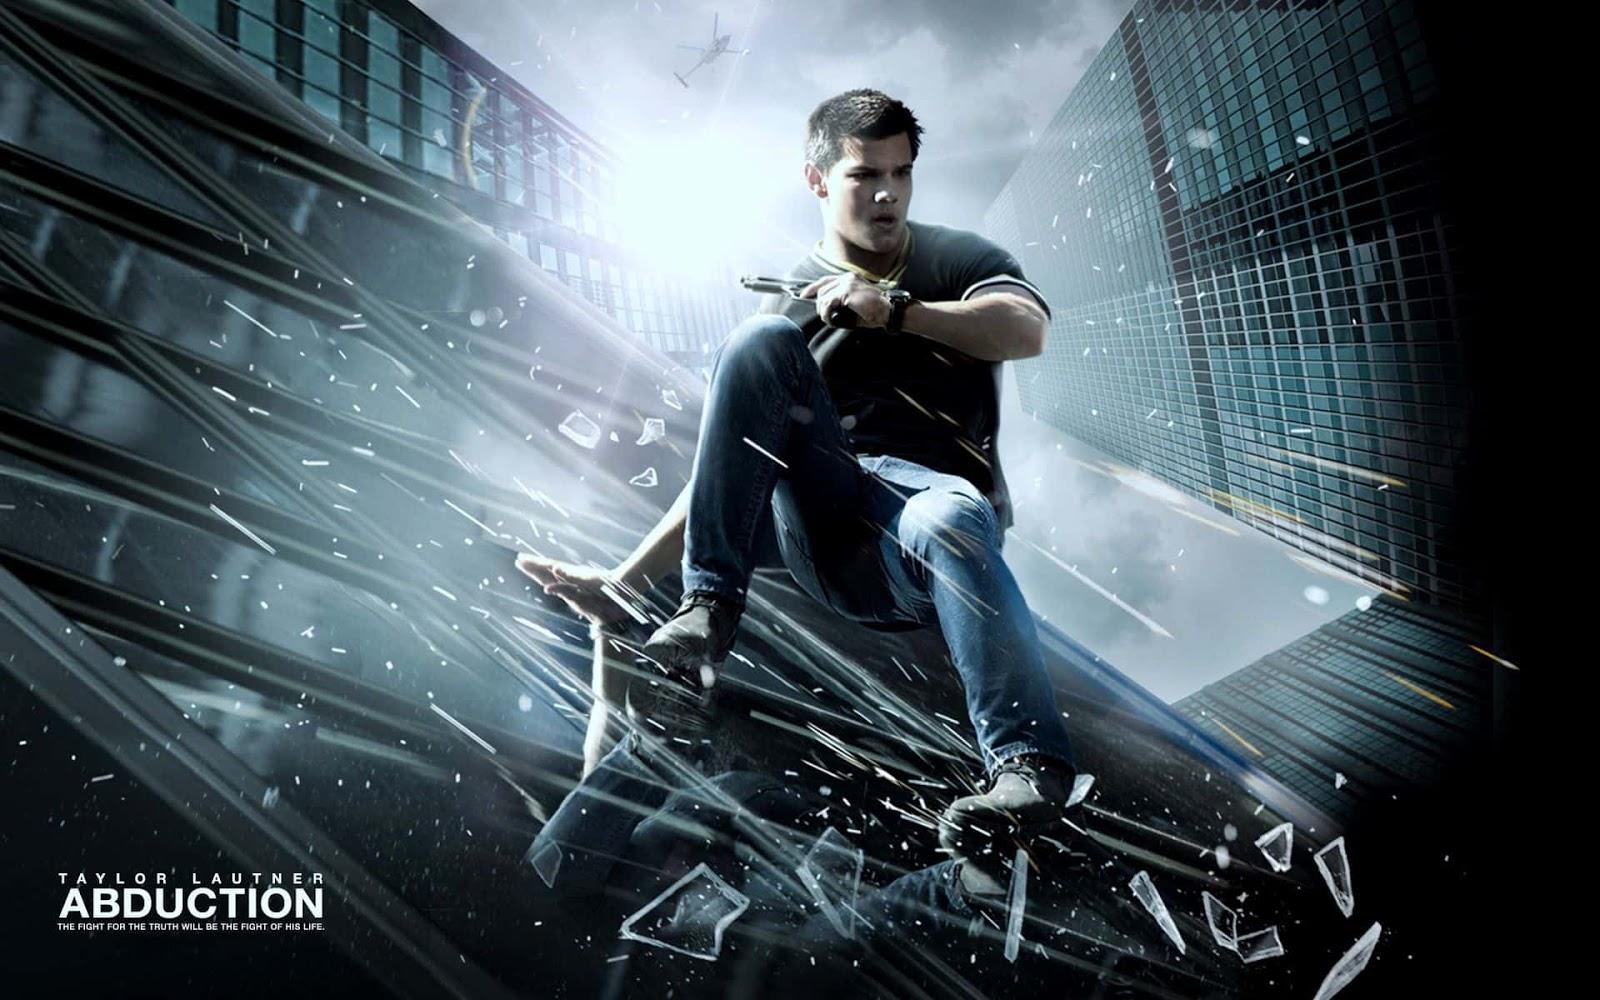 abduction 2011 full movie download 480p